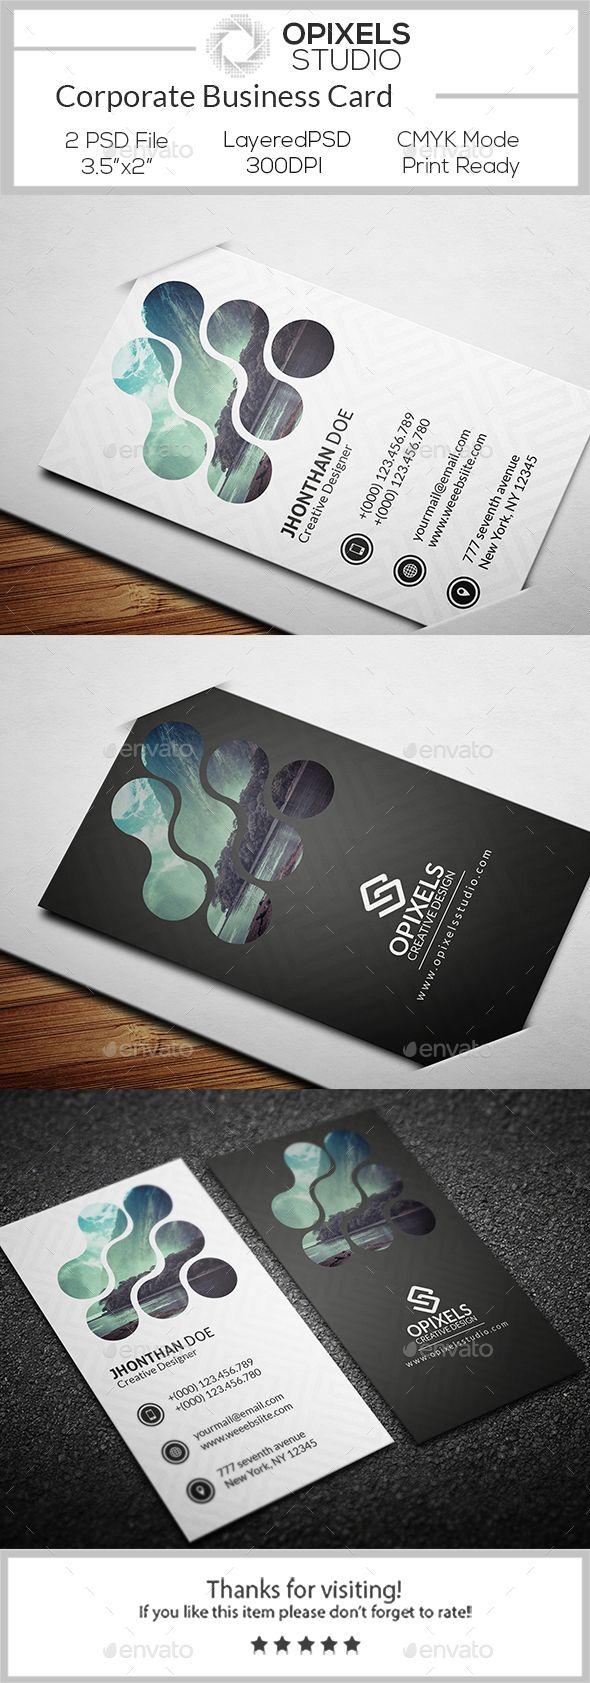 Corporate Business Card Template Psd Business Card Branding Business Card Design Business Card Inspiration